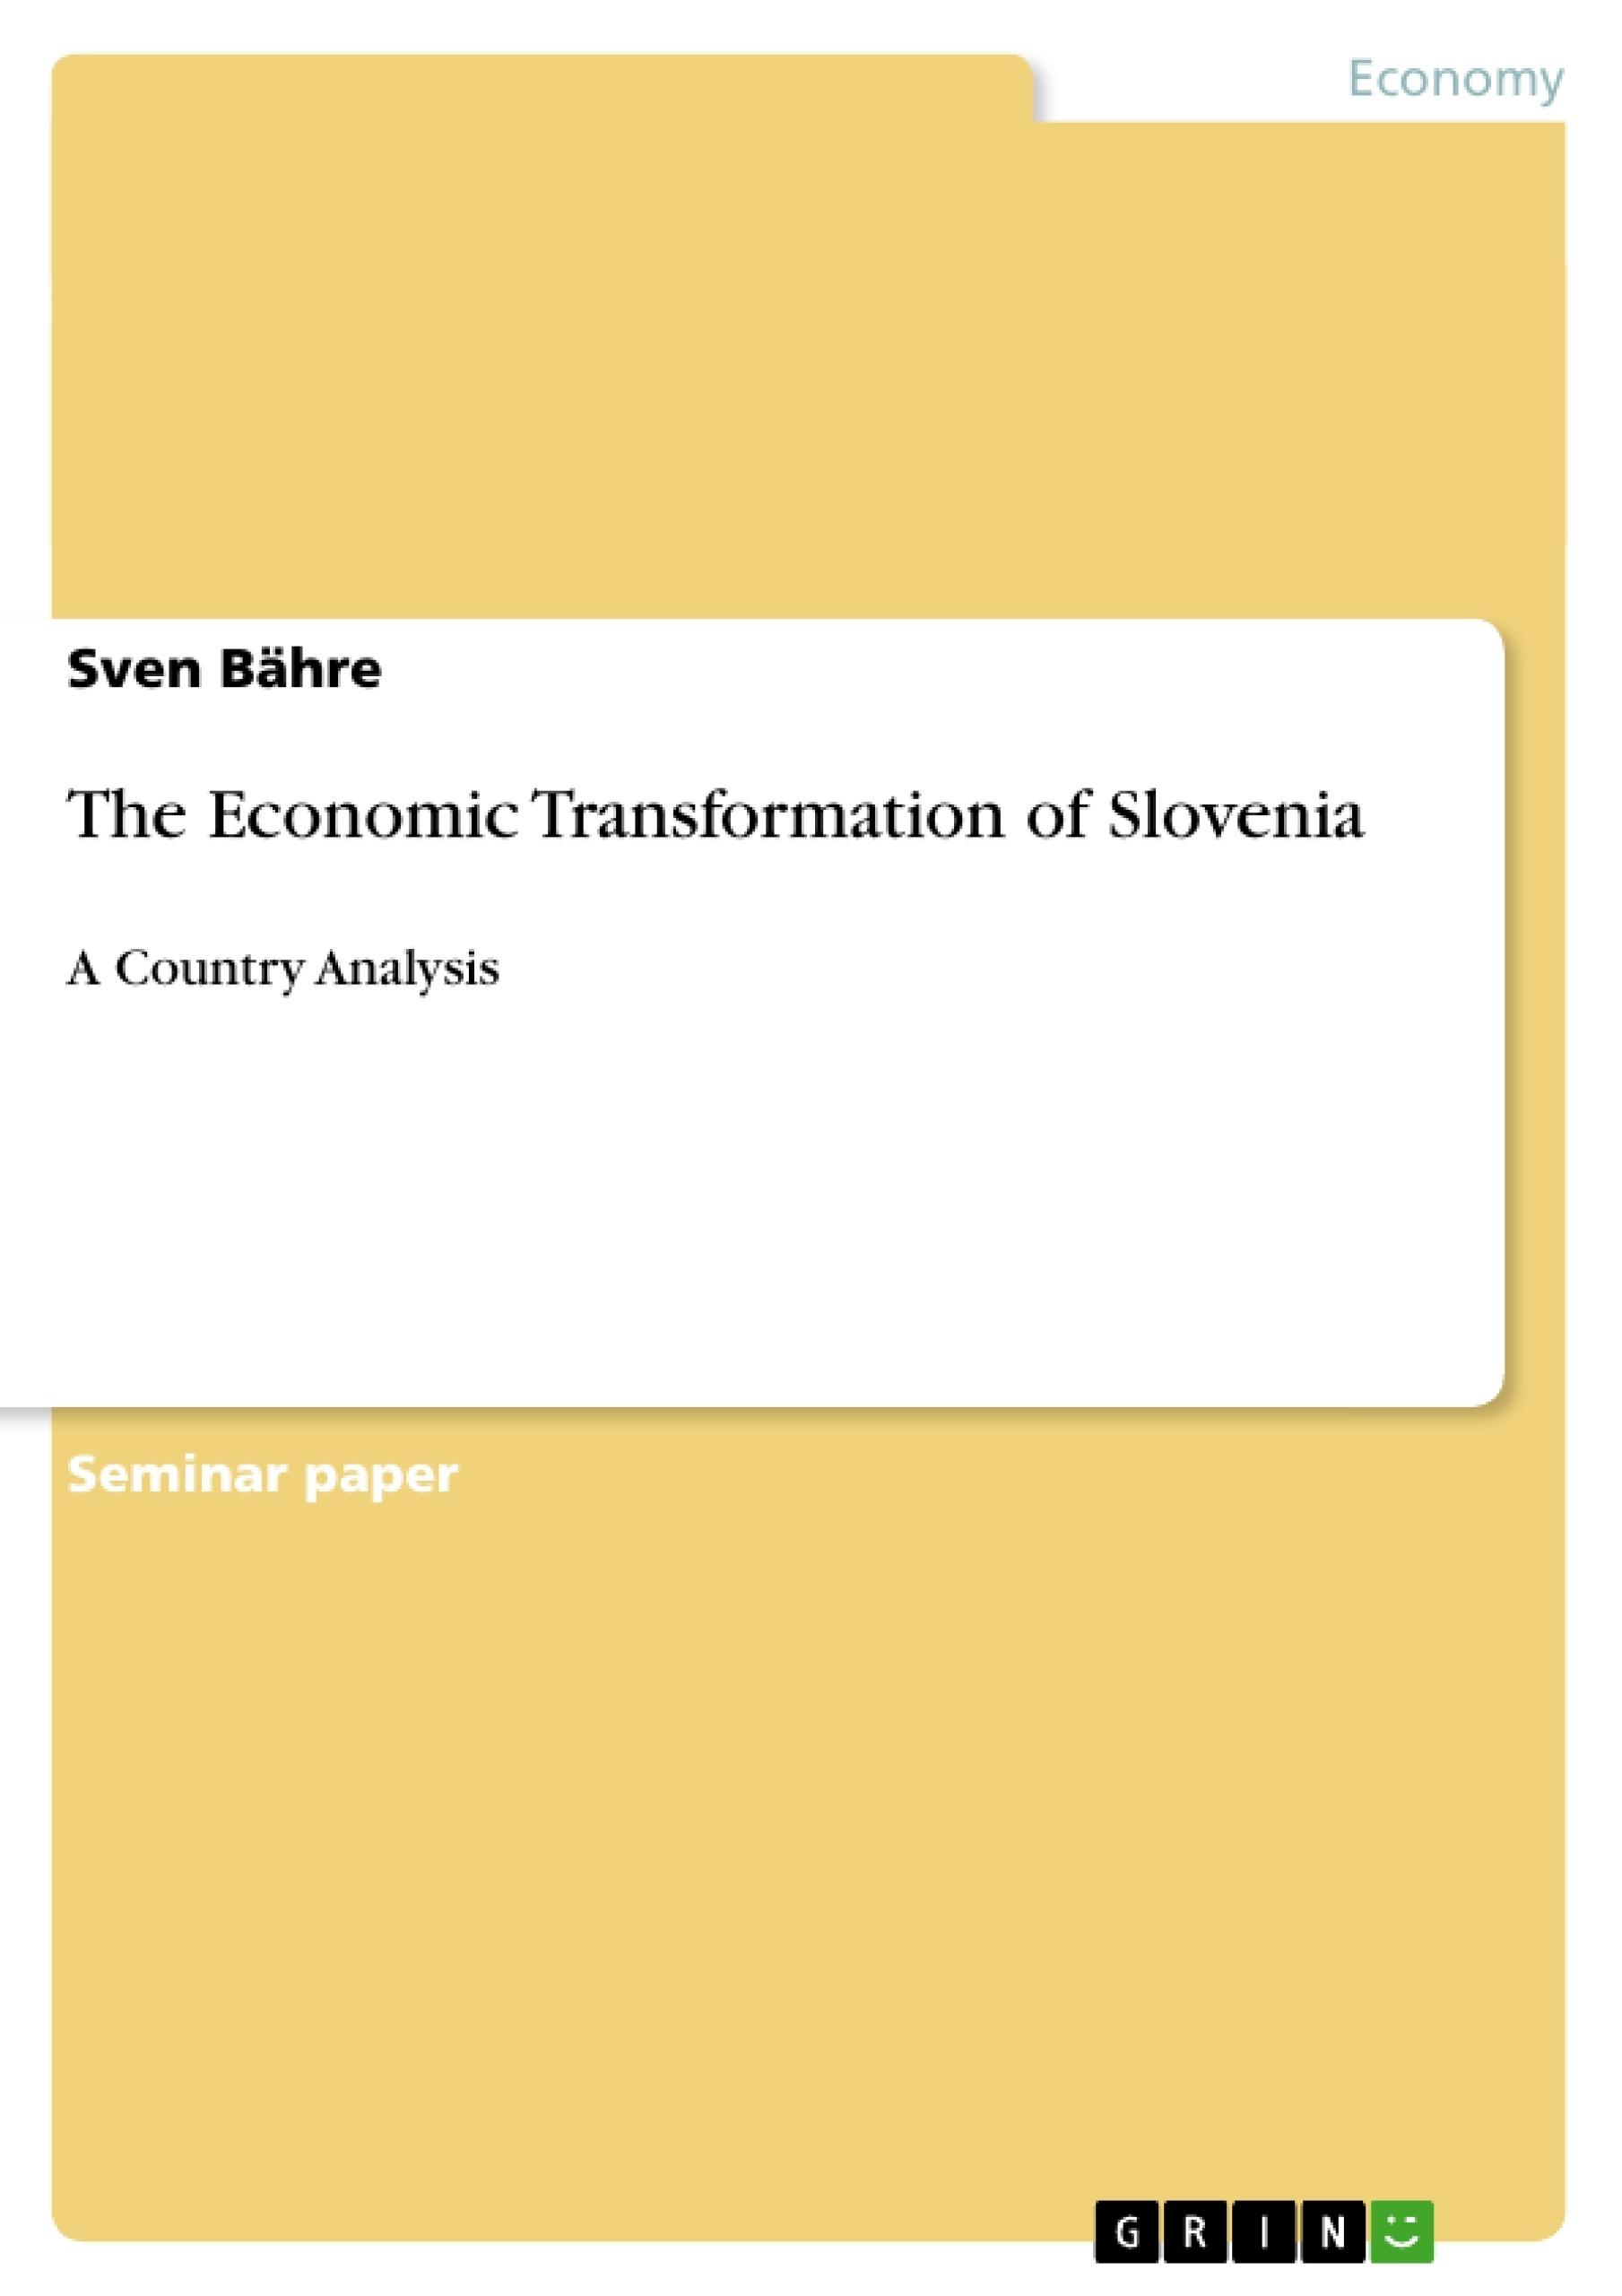 Title: The Economic Transformation of Slovenia